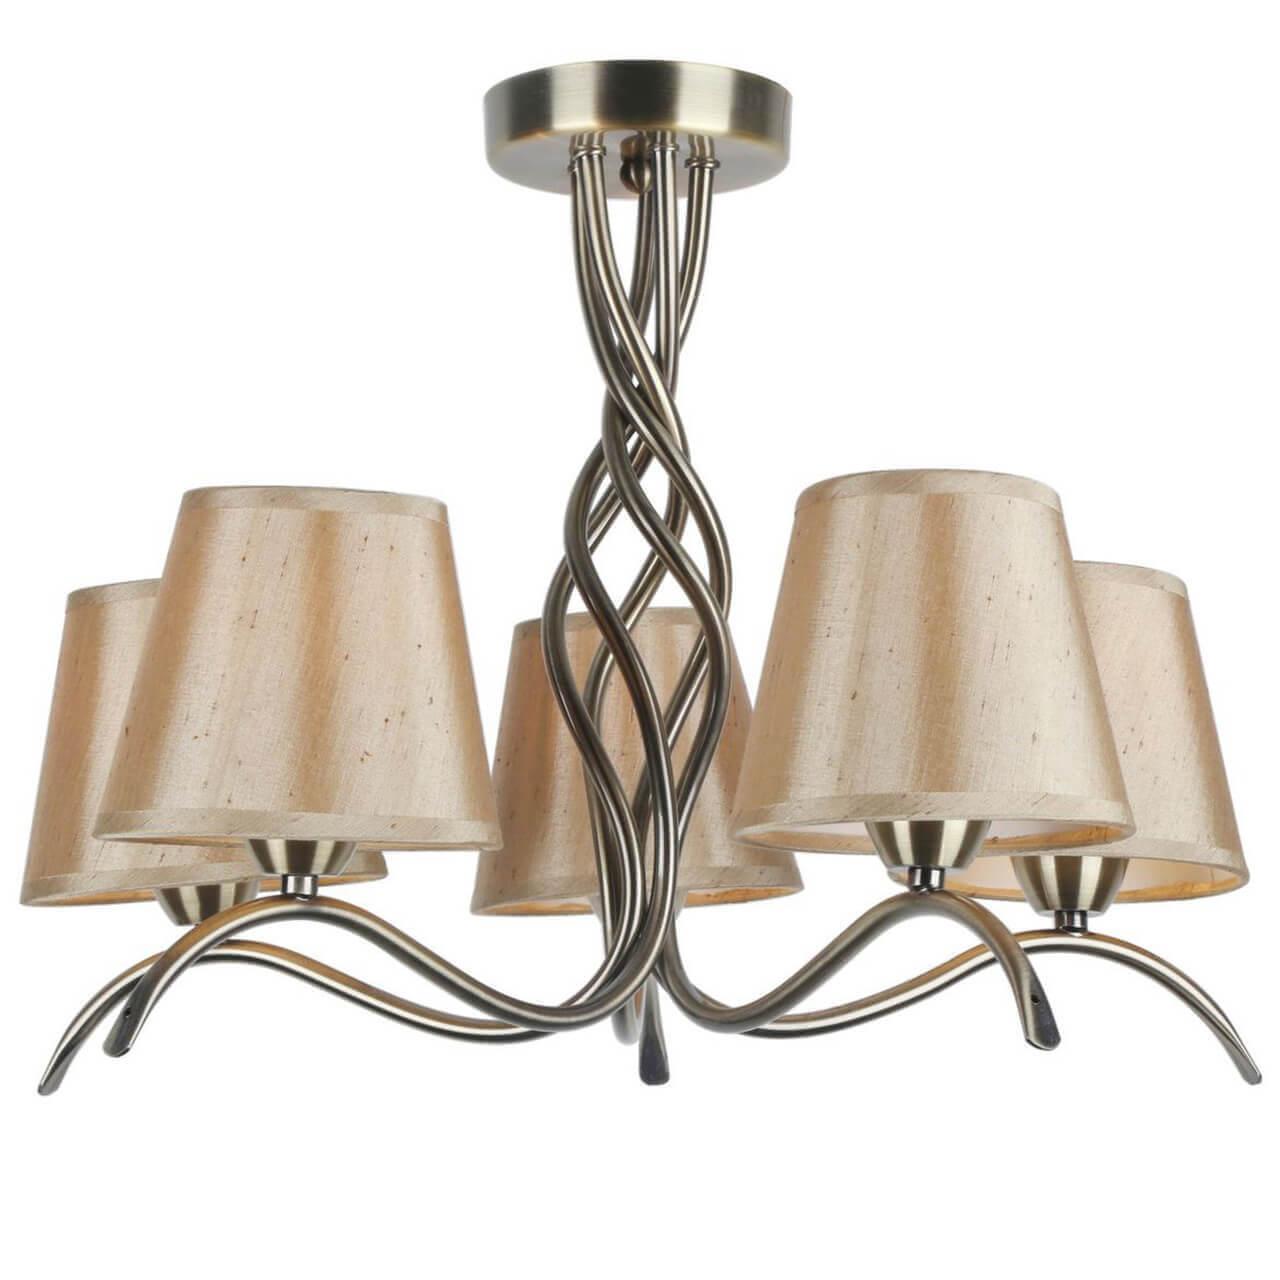 Люстра Arte Lamp A6569PL-5AB 60 люстра потолочная arte lamp corniolo a9534pl 5ab